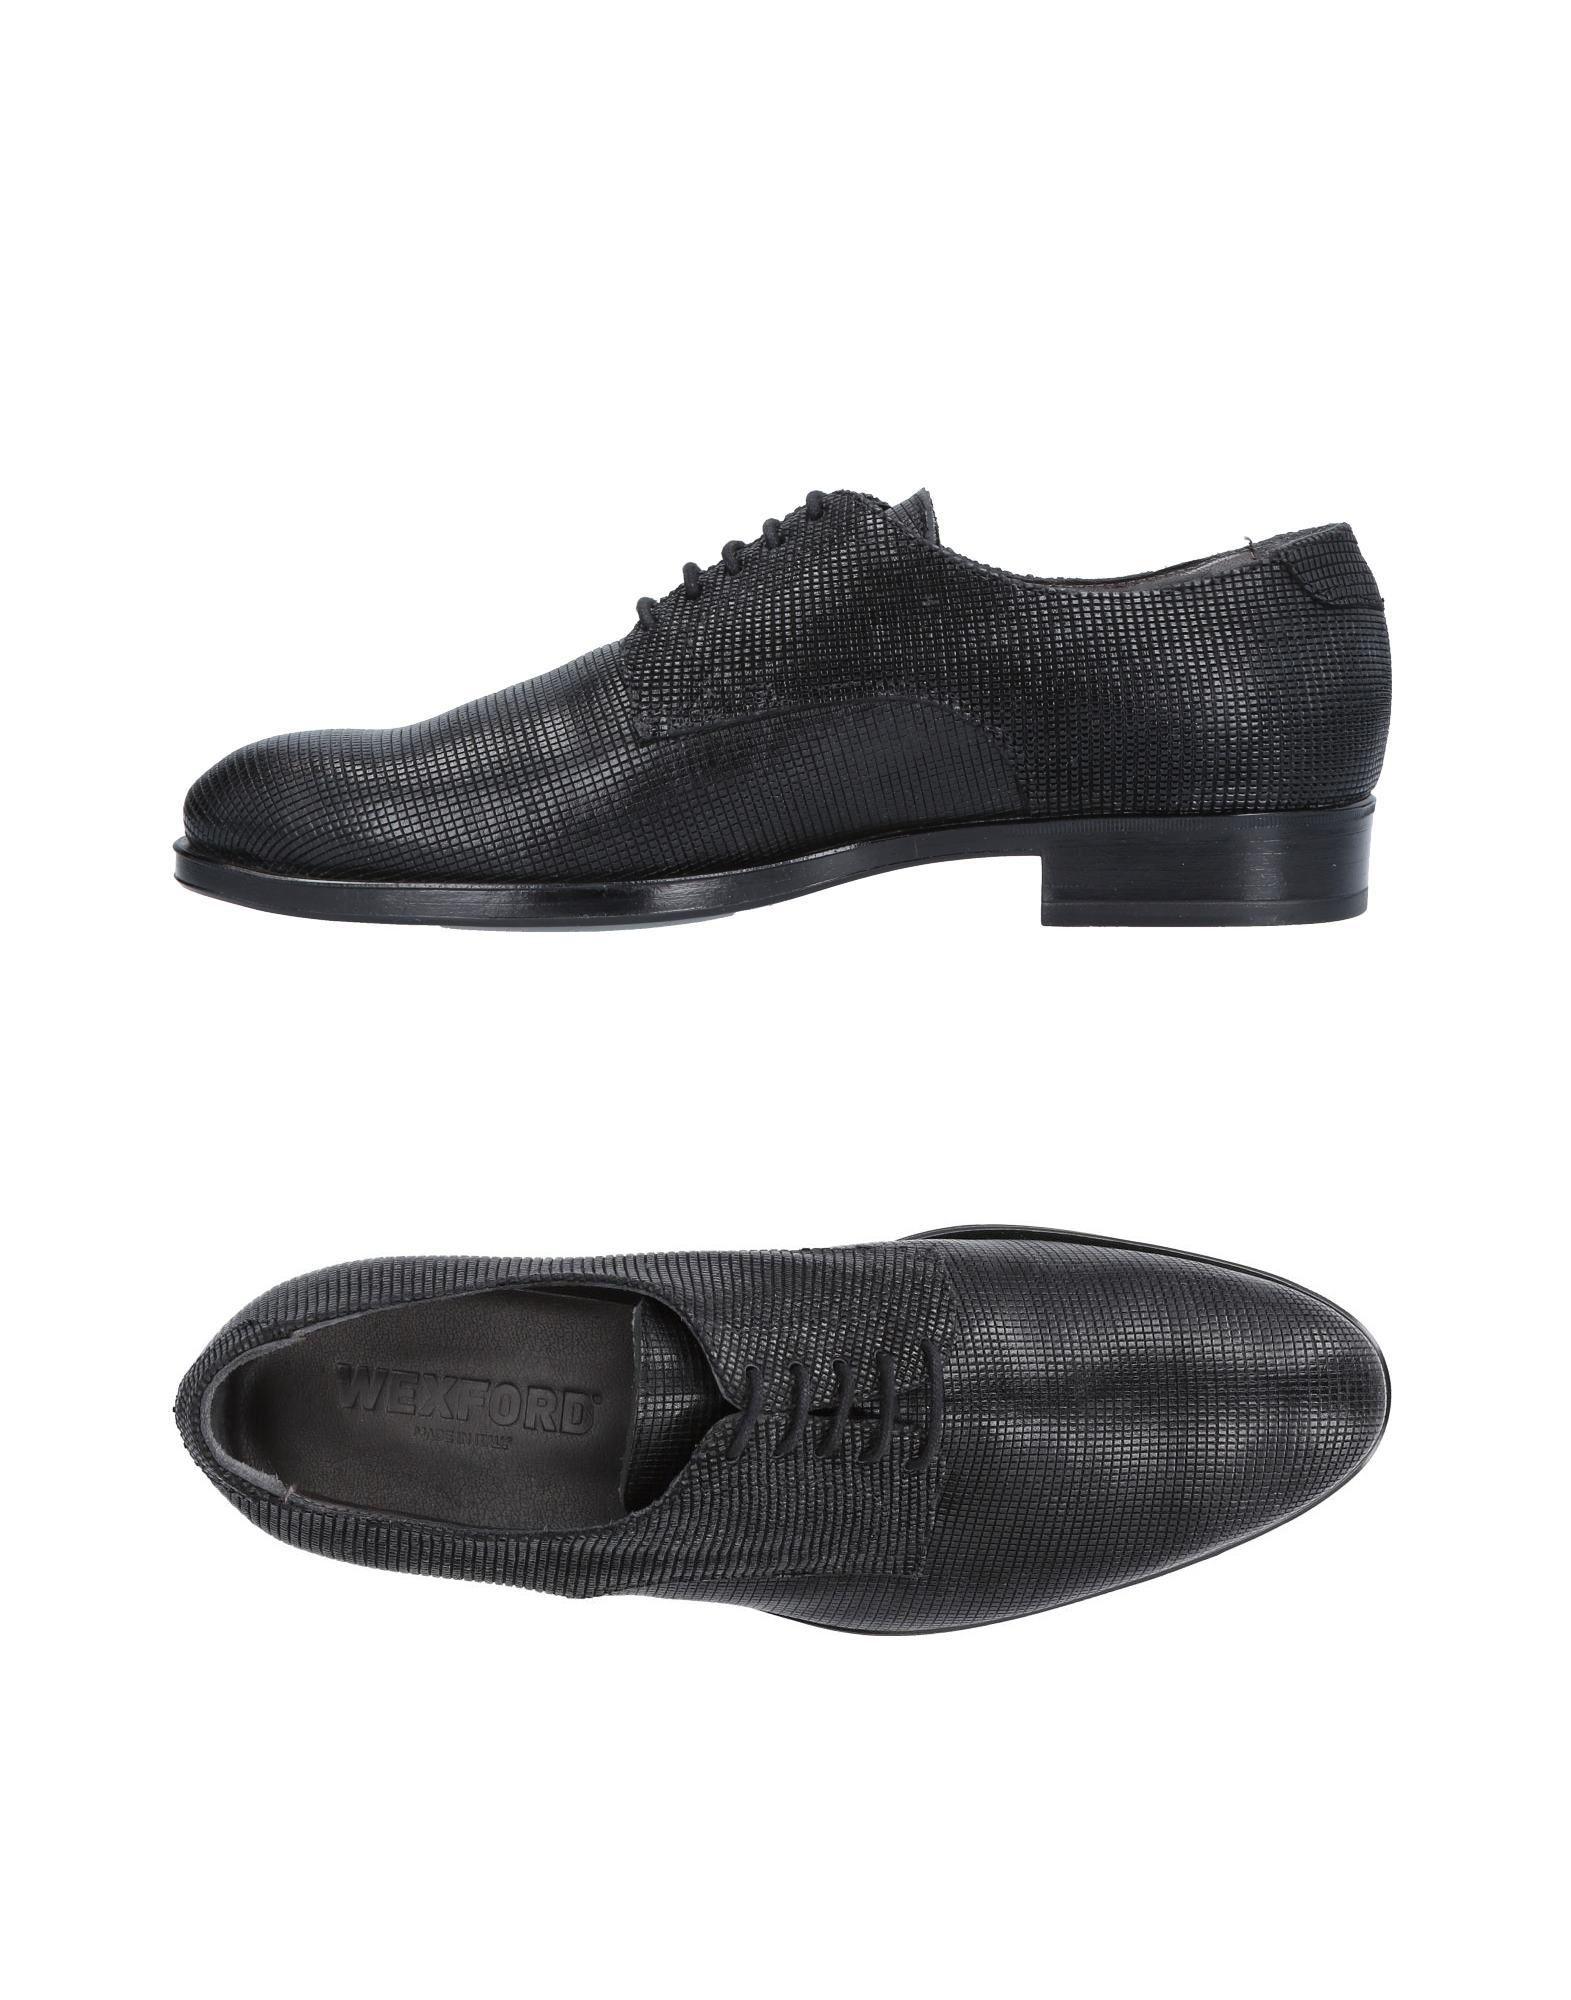 Rabatt echte Schuhe Wexford Schnürschuhe Herren  11491118RP